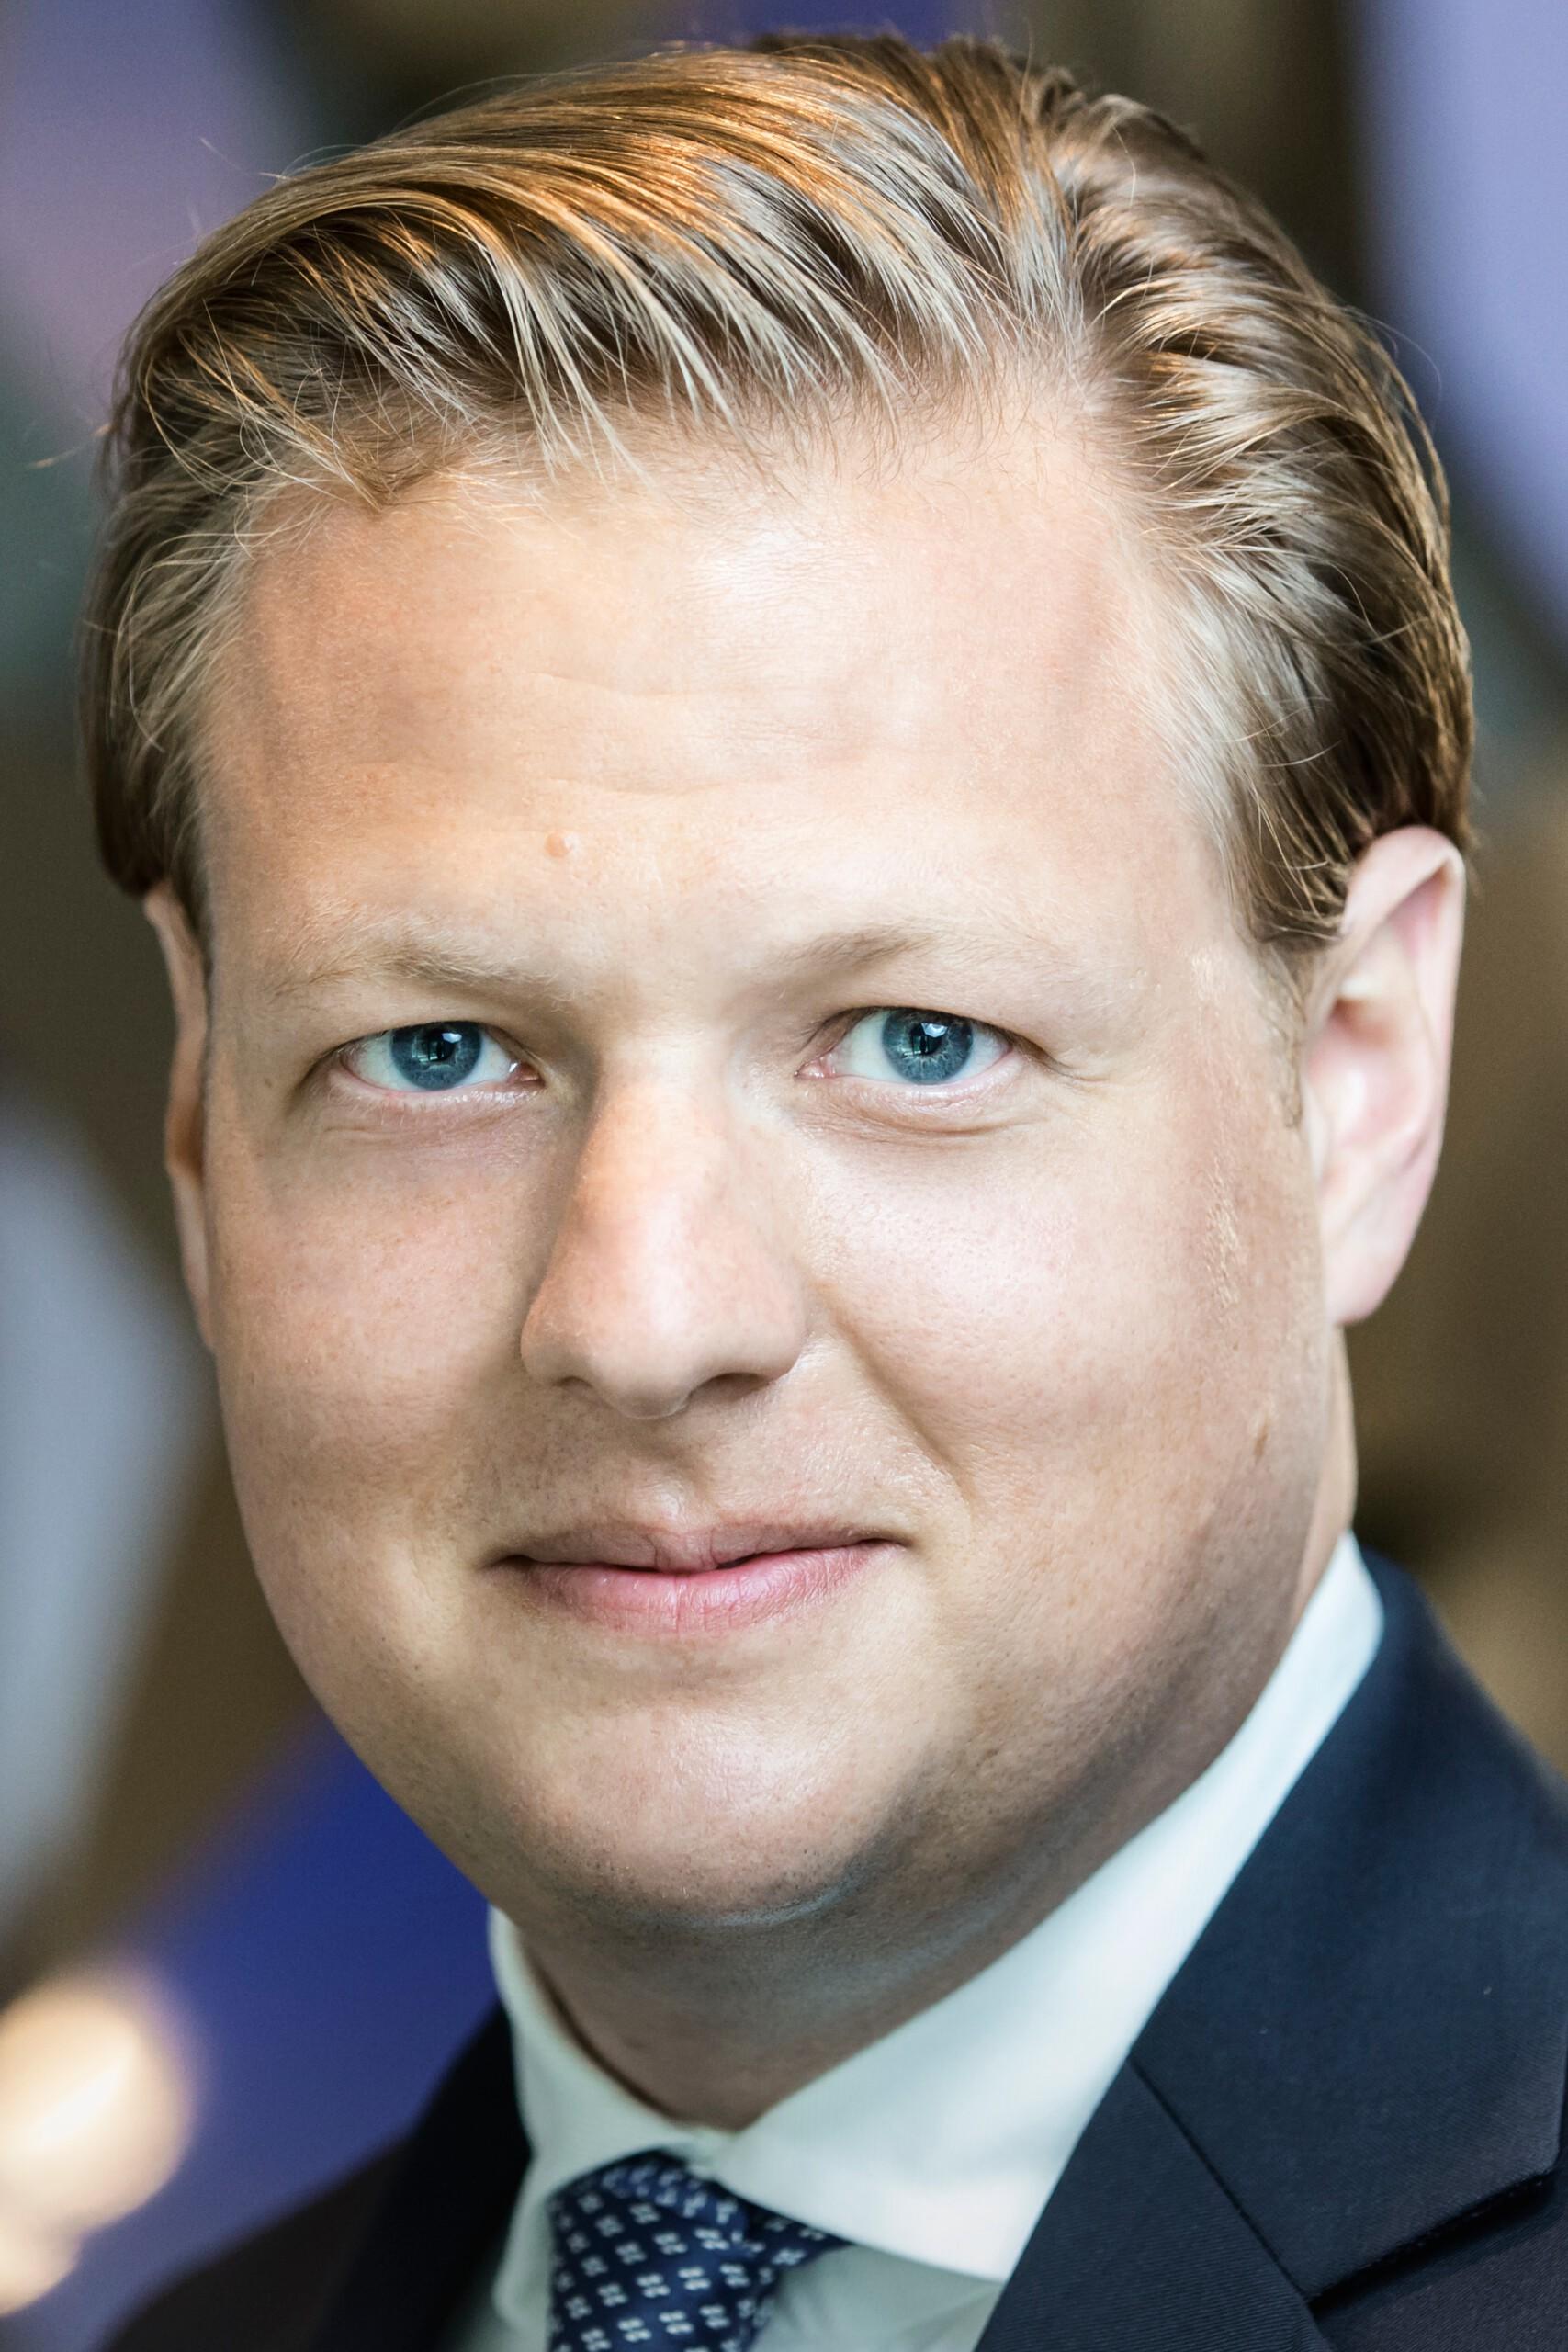 HAUKE BURKHARDT